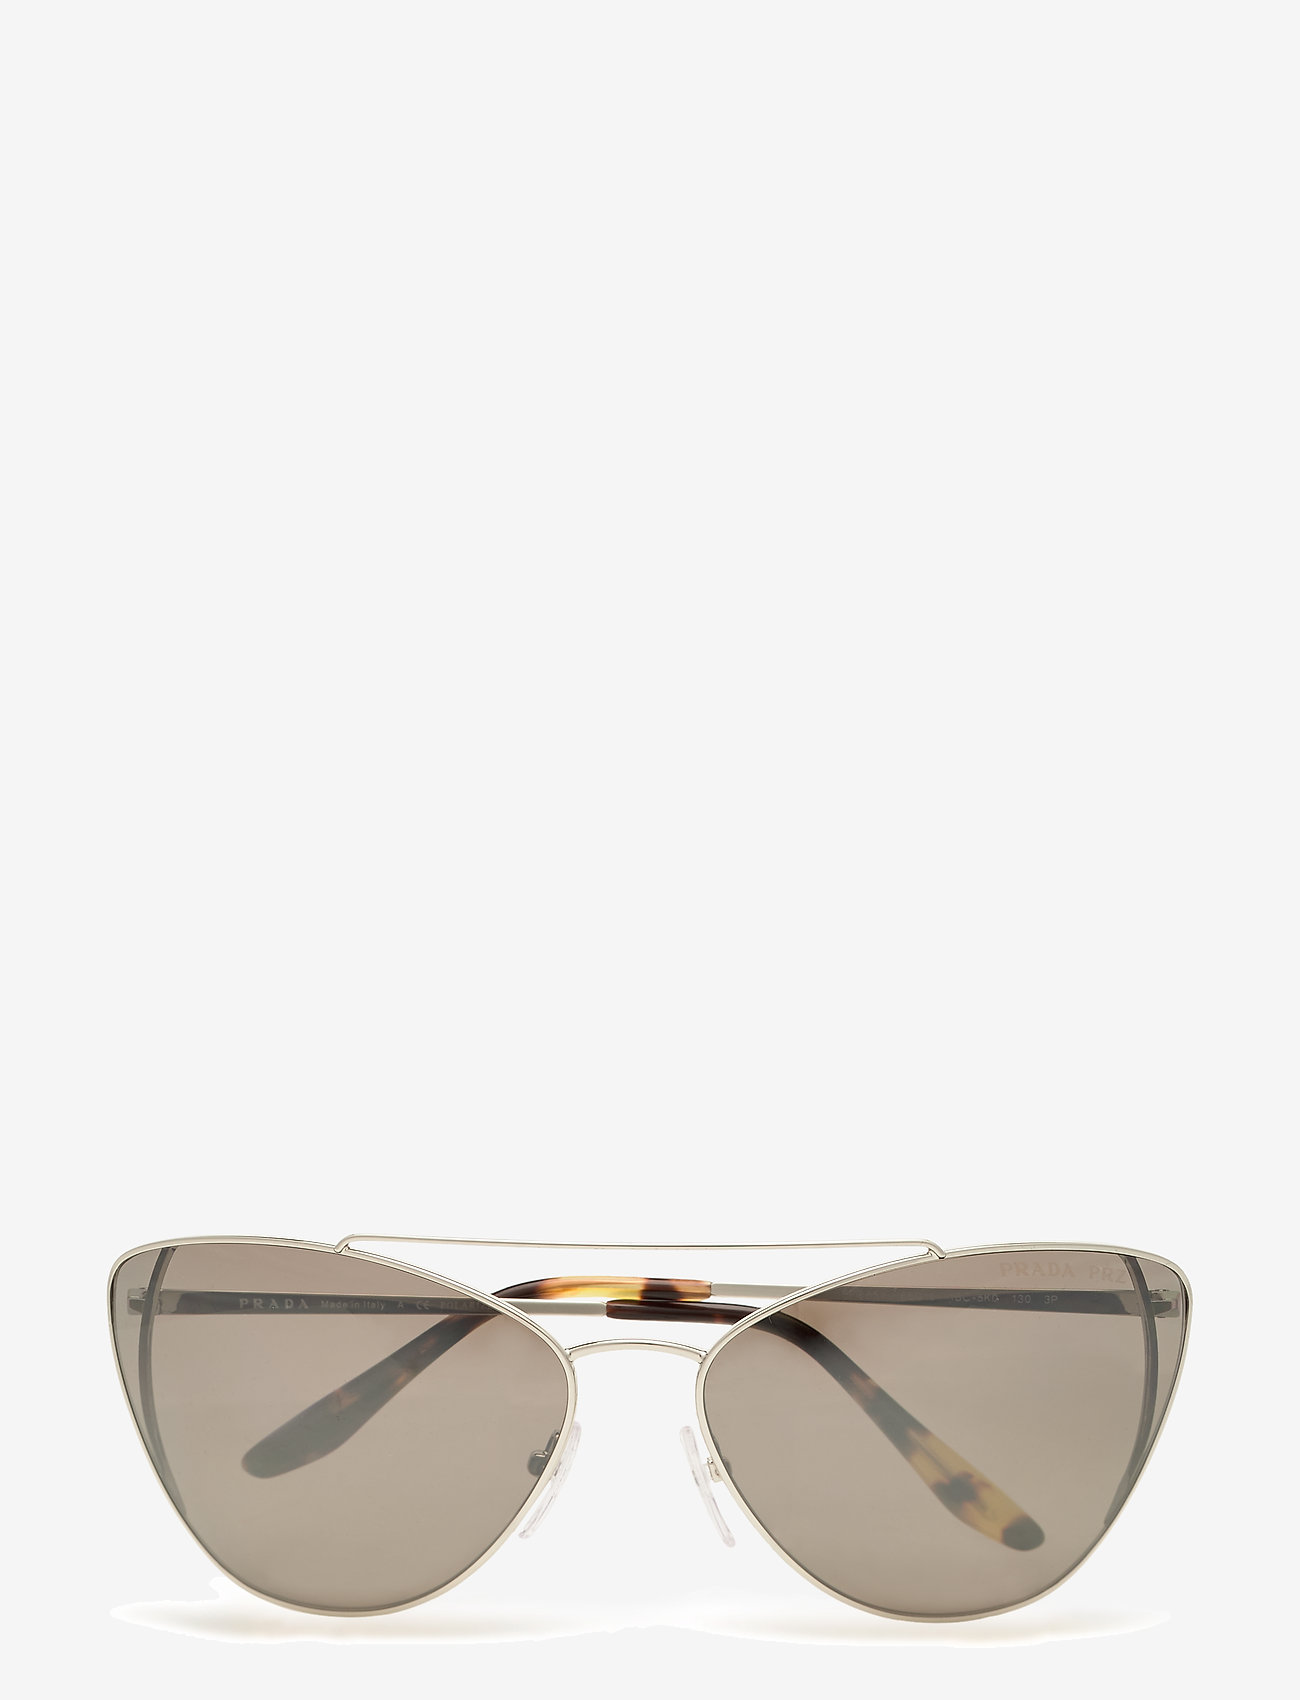 Prada Sunglasses - Prada Sunglasses - cat-eye - silver - 0